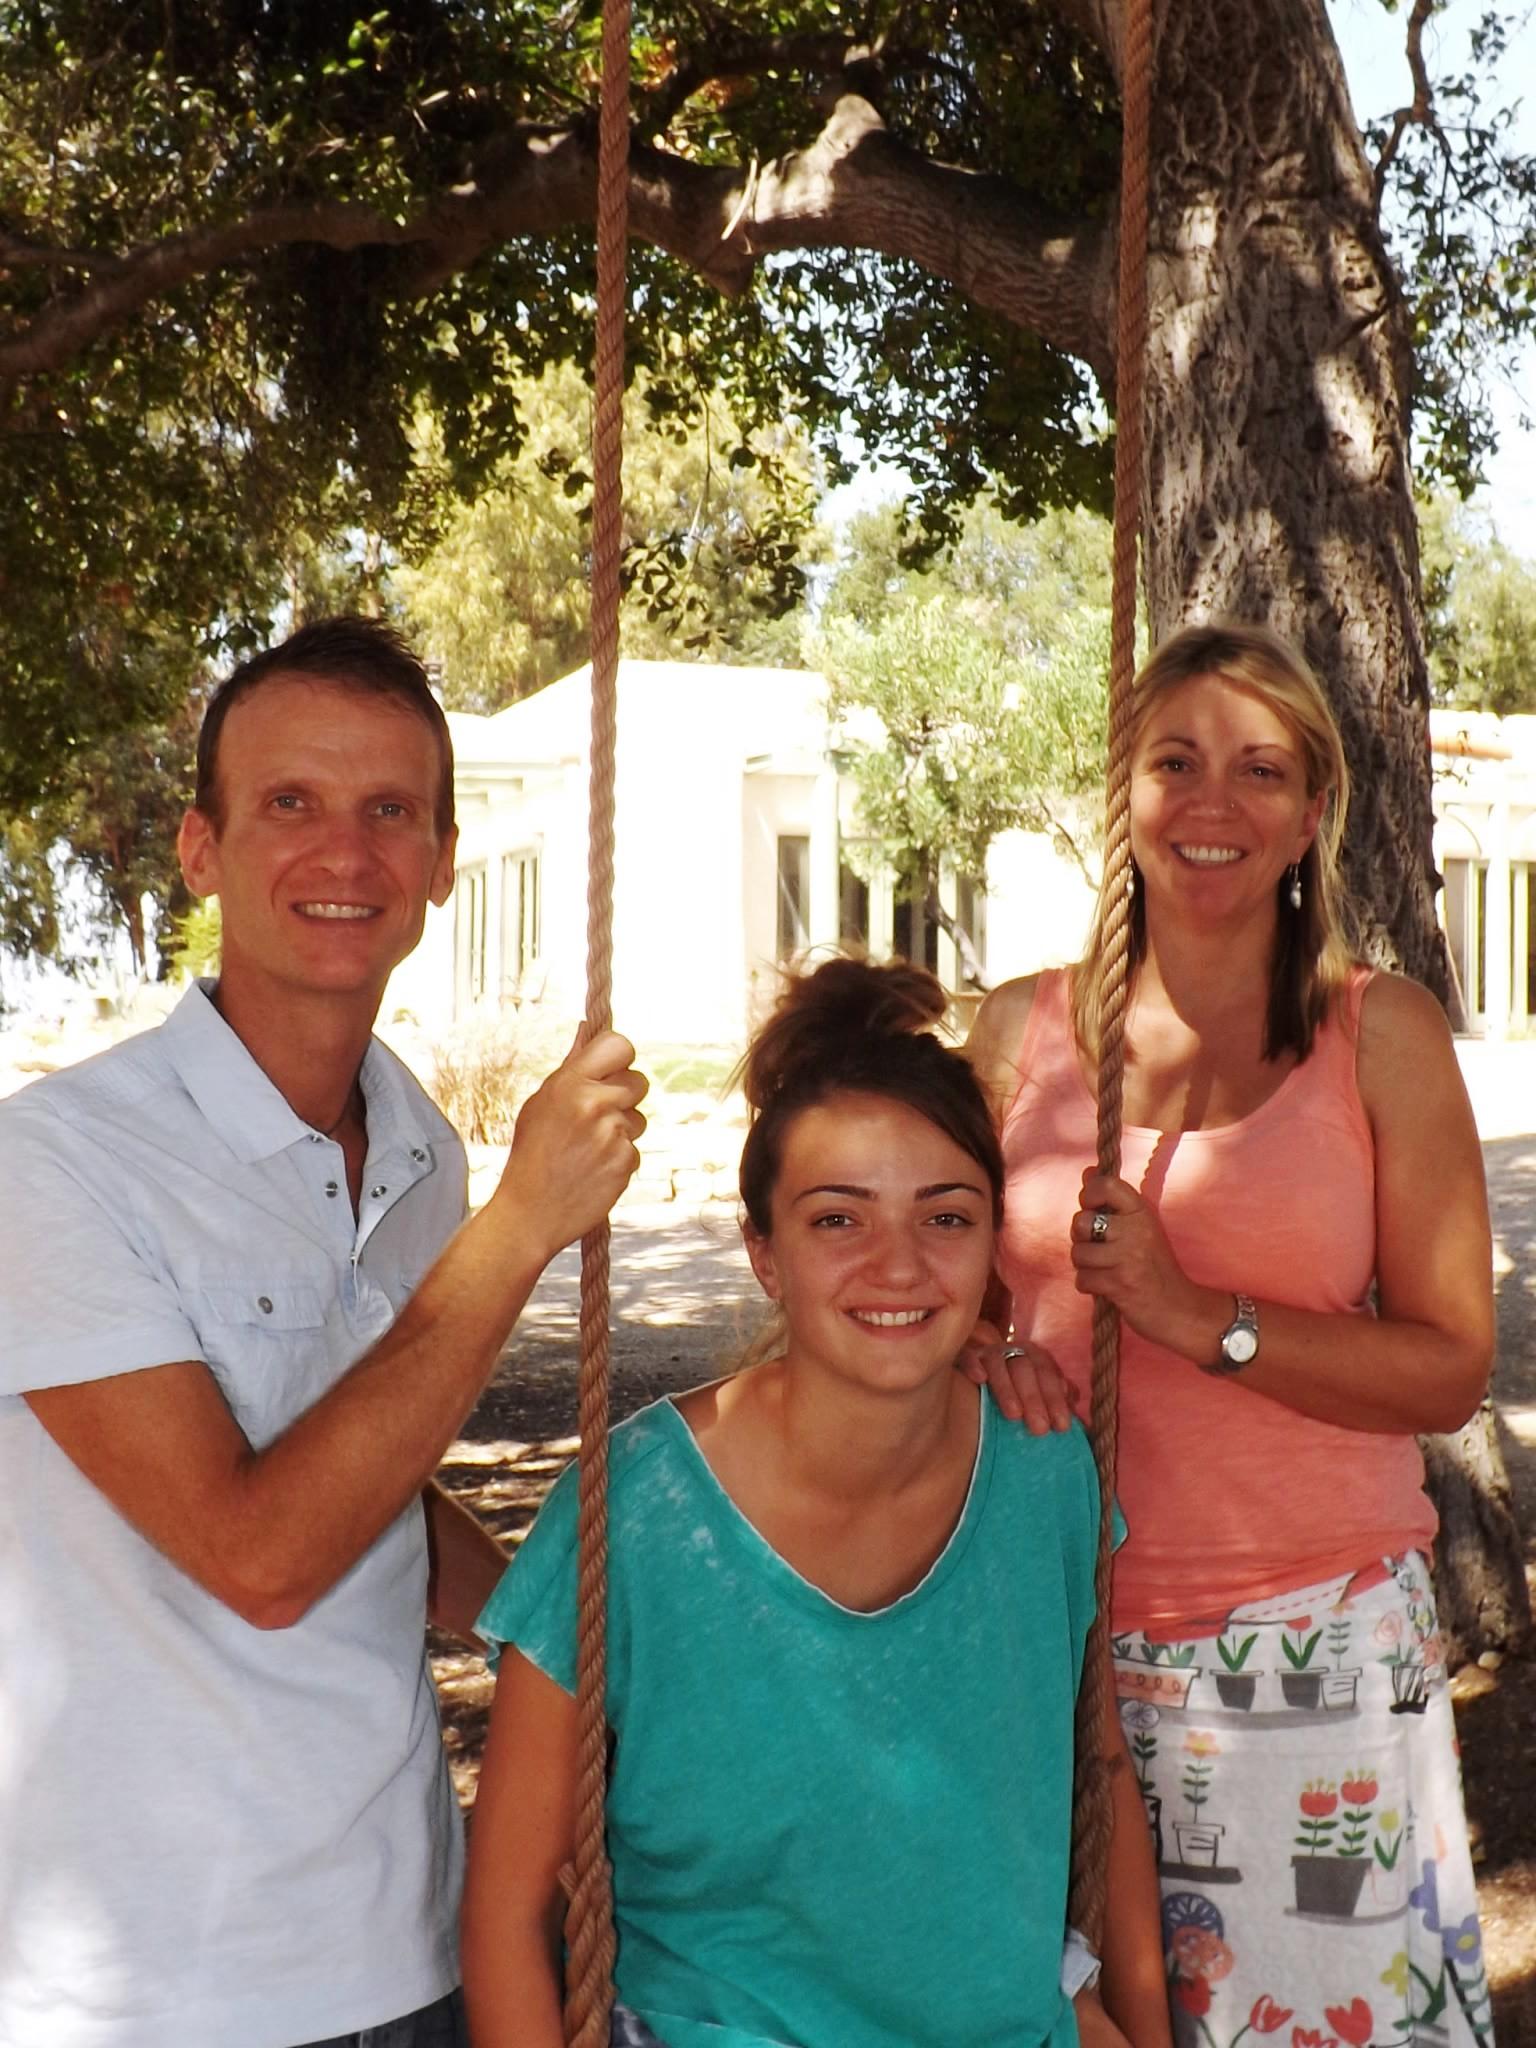 LESLIE, GEORGIE & SAMANTHA BRIDGER at Meher Mount during their stay as Manager/Caretakers. (Photo: Bridger Family, 2012)